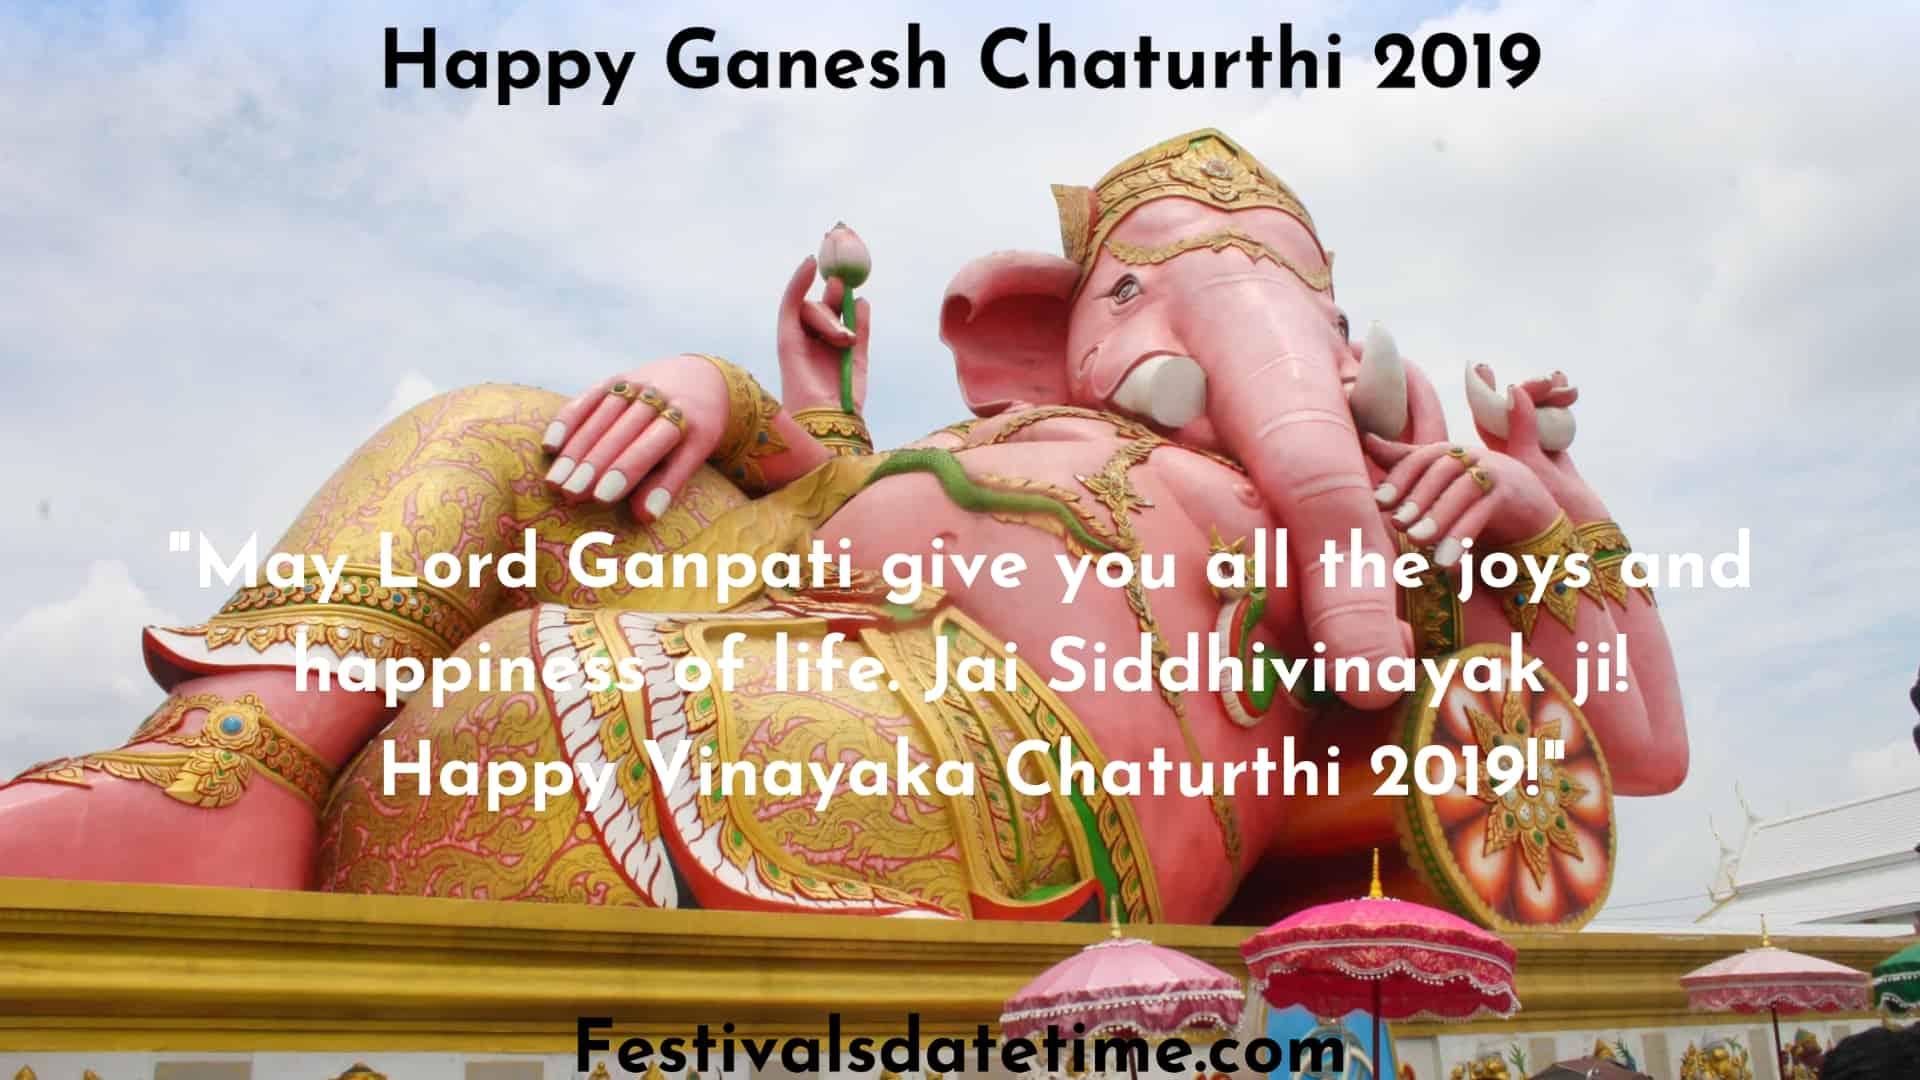 ganesh_chaturthi_images_for_whatsapp_status